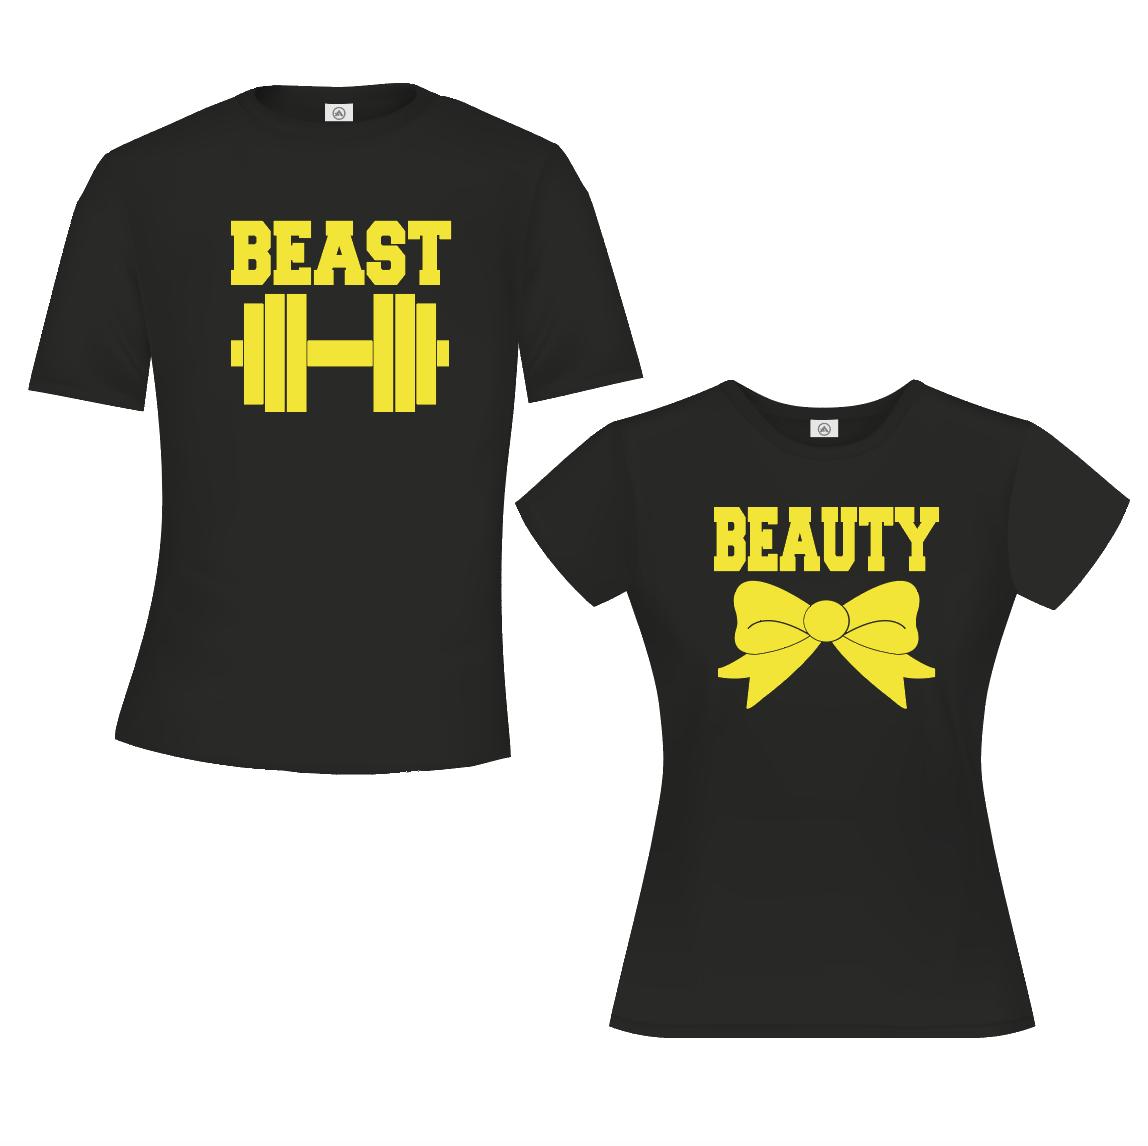 Beauty & Beast - Zwart & Geel 01933